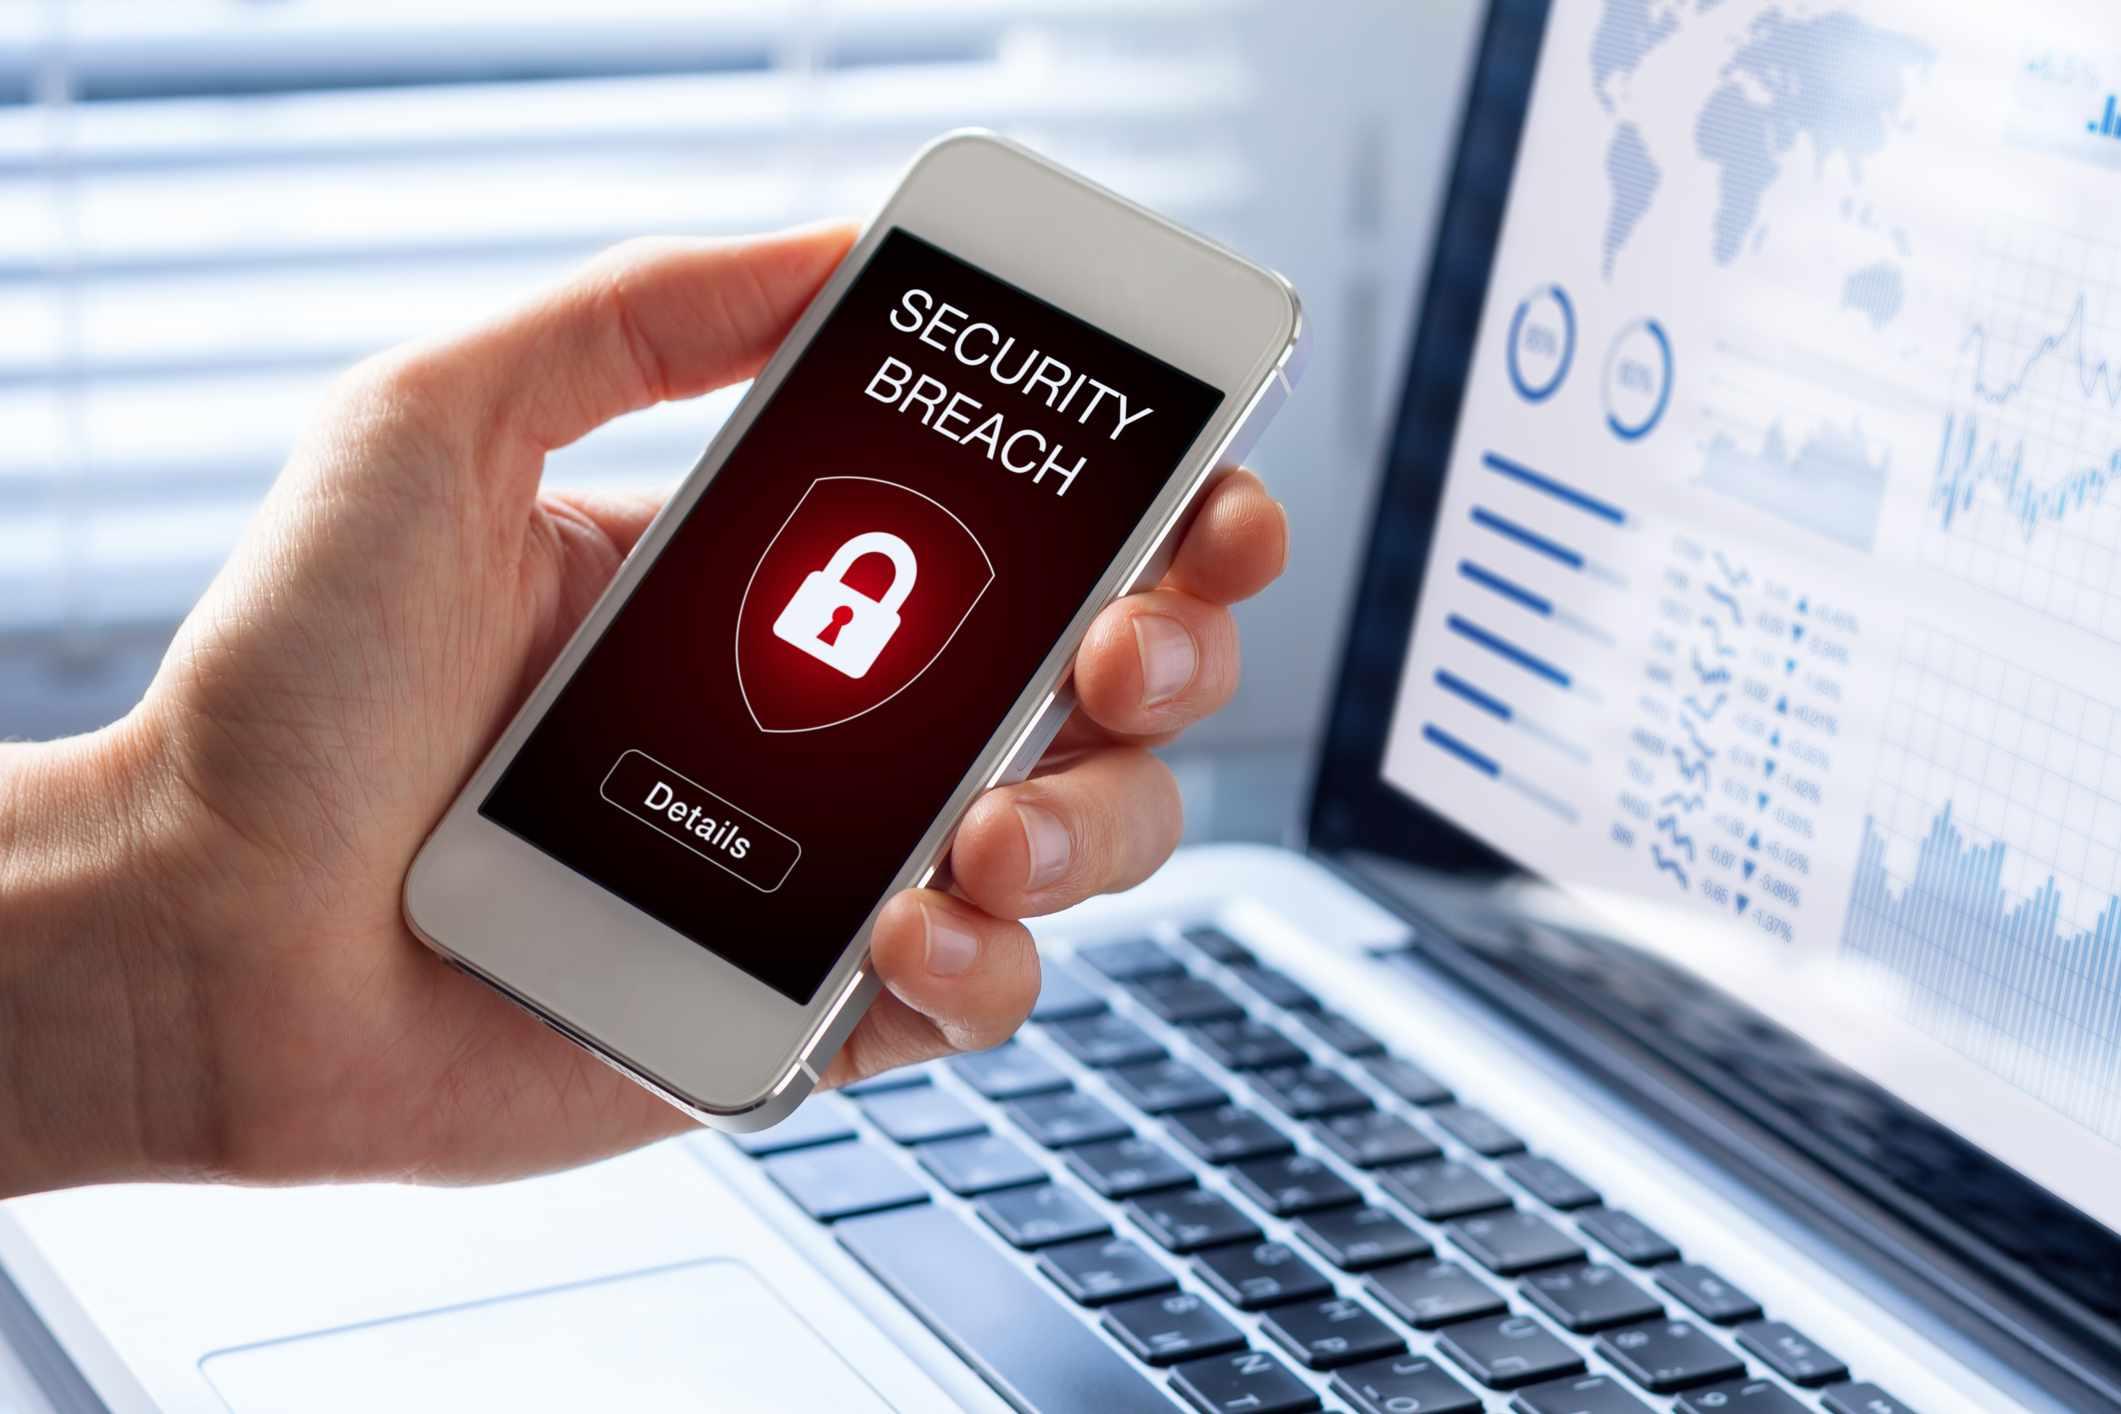 Security breach on phone screen